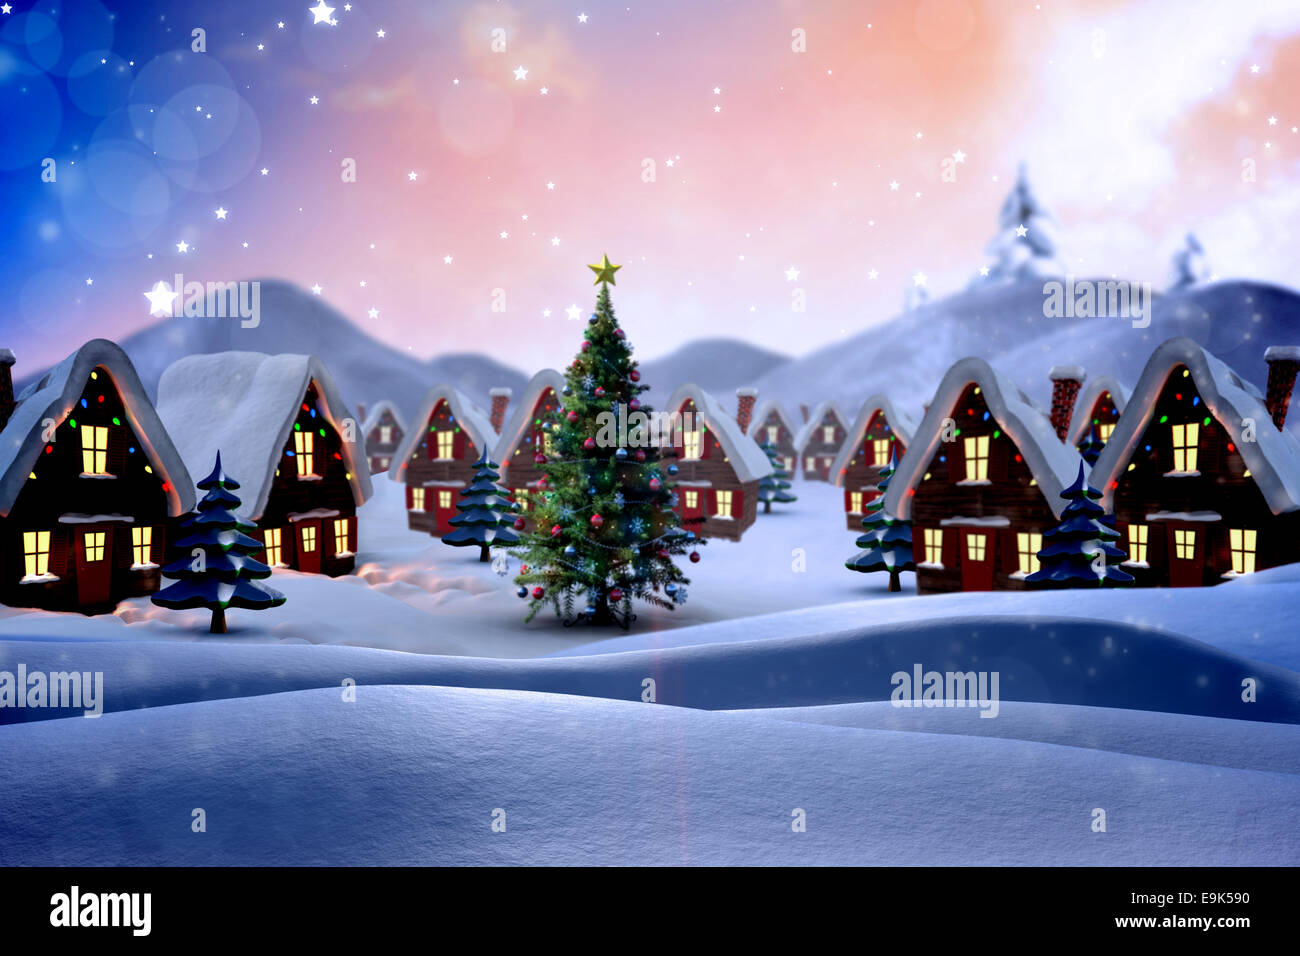 christmas village stockfotos christmas village bilder. Black Bedroom Furniture Sets. Home Design Ideas